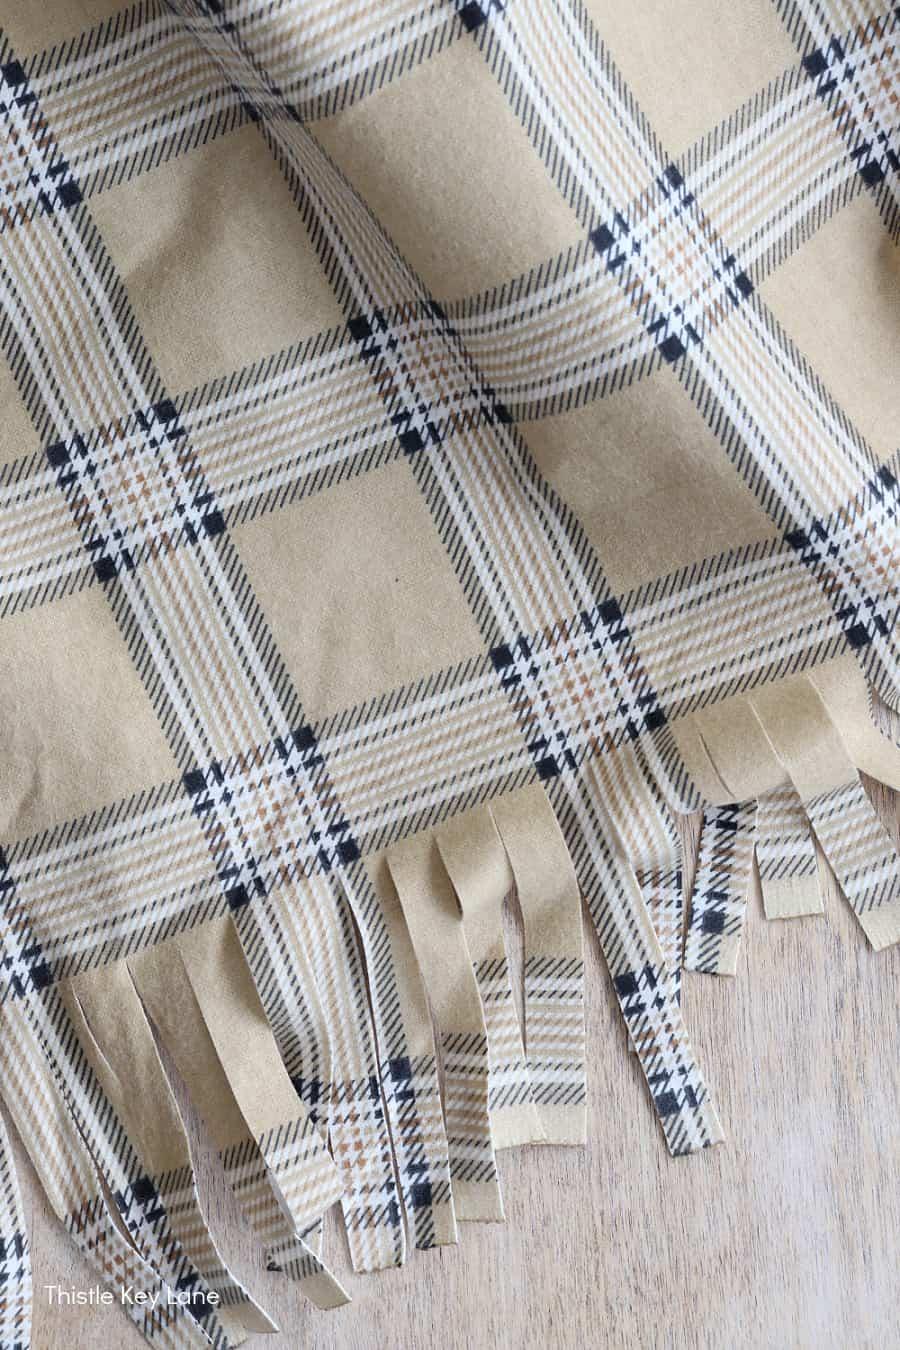 Plaid fabric with fringe cuts.